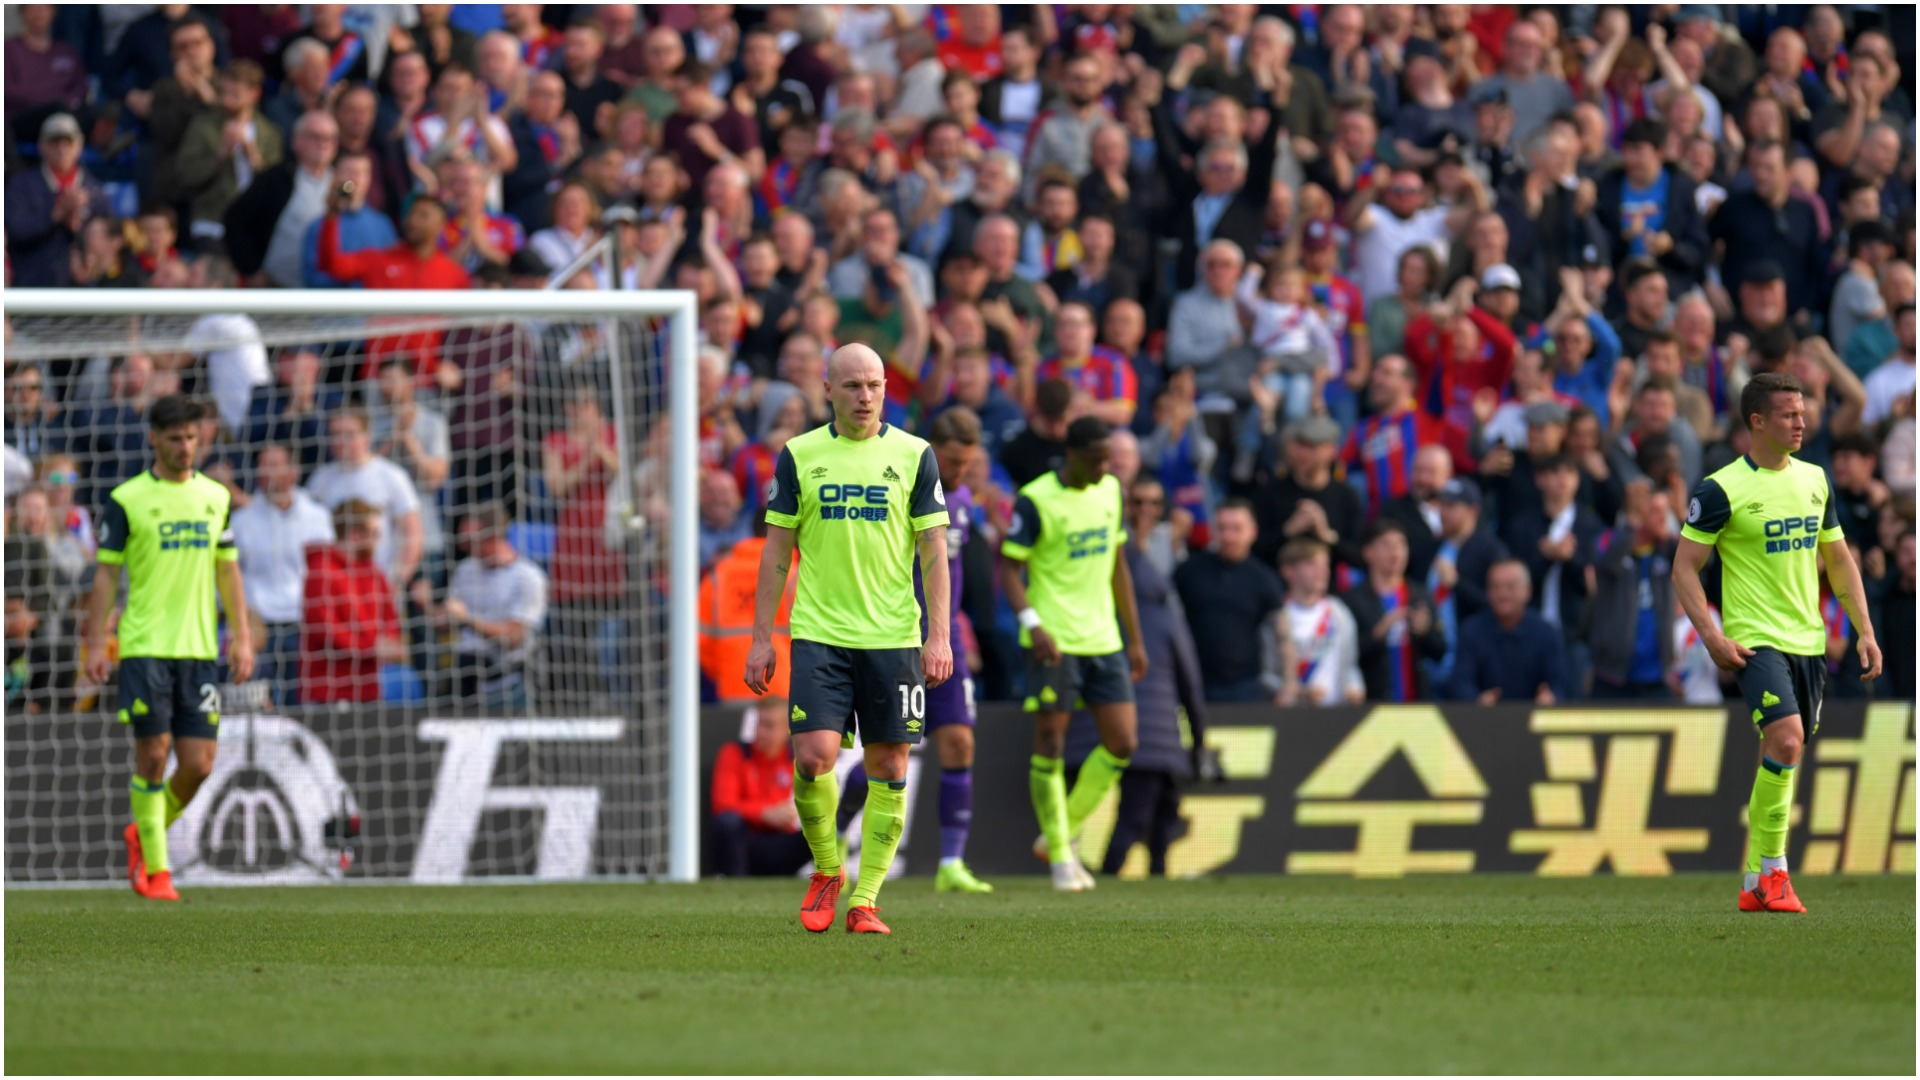 Premier League news: Huddersfield Town relegated from Premier League | Goal.com